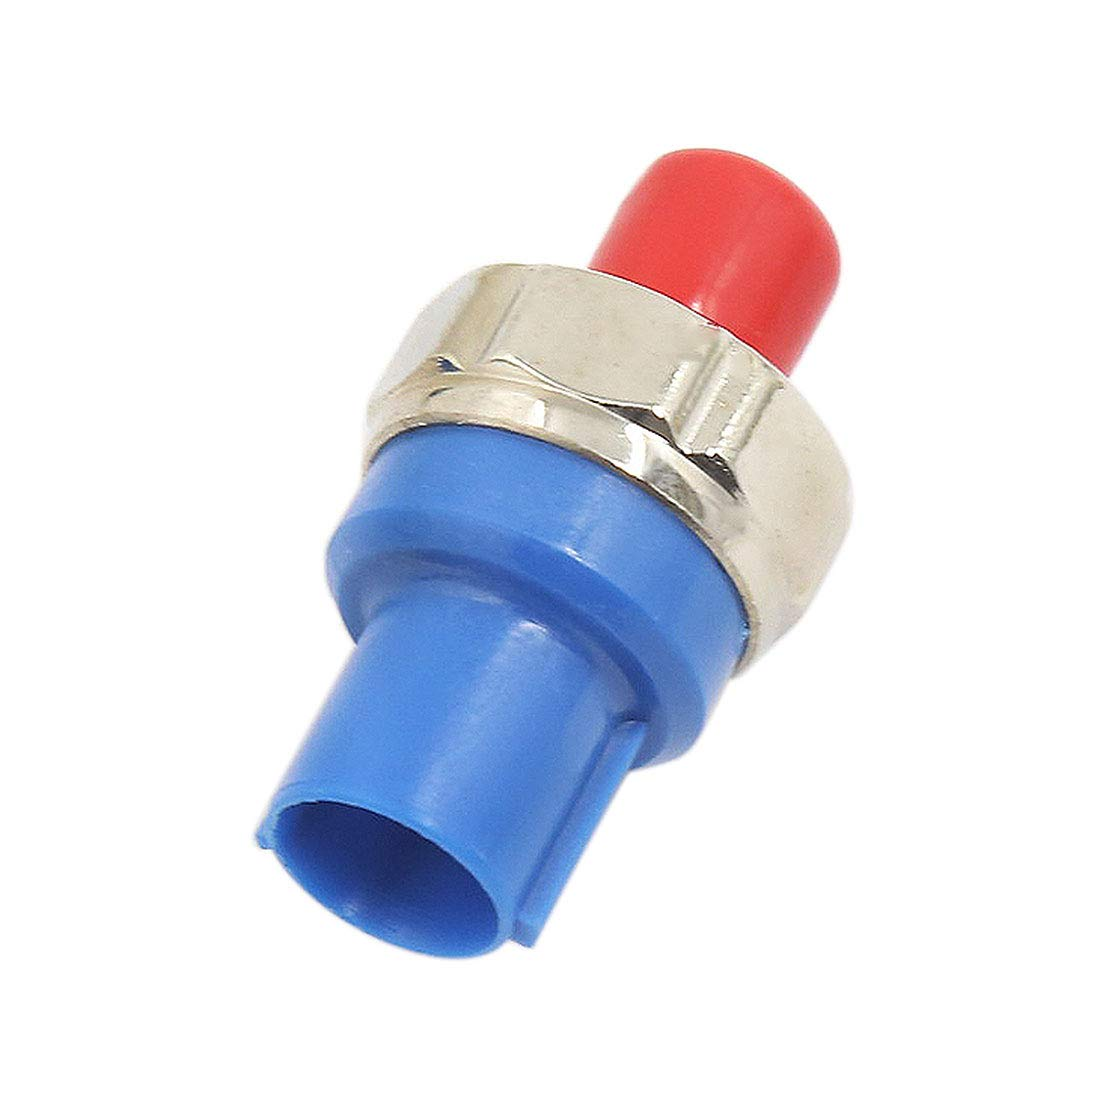 Engine Ignition Knock Detonation Sensor 30530-P2M-A01 for Honda Civic Acura RL